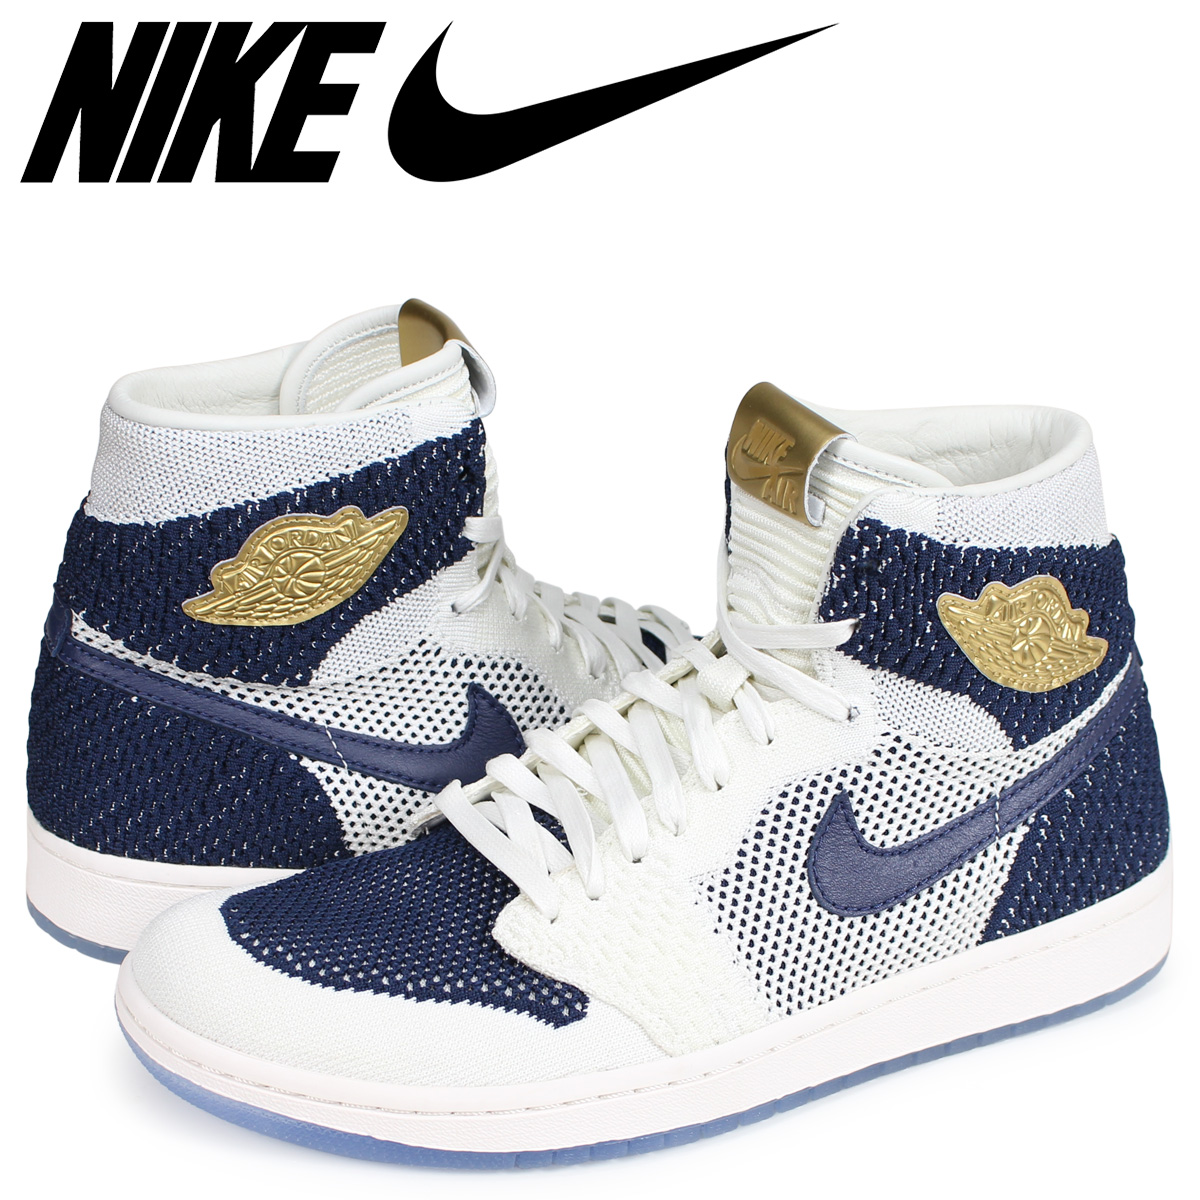 best website 2db0e d0370 NIKE AIR JORDAN 1 RETRO HI FLYKNIT JETER Nike Air Jordan 1 sneakers men  navy 553,558-481